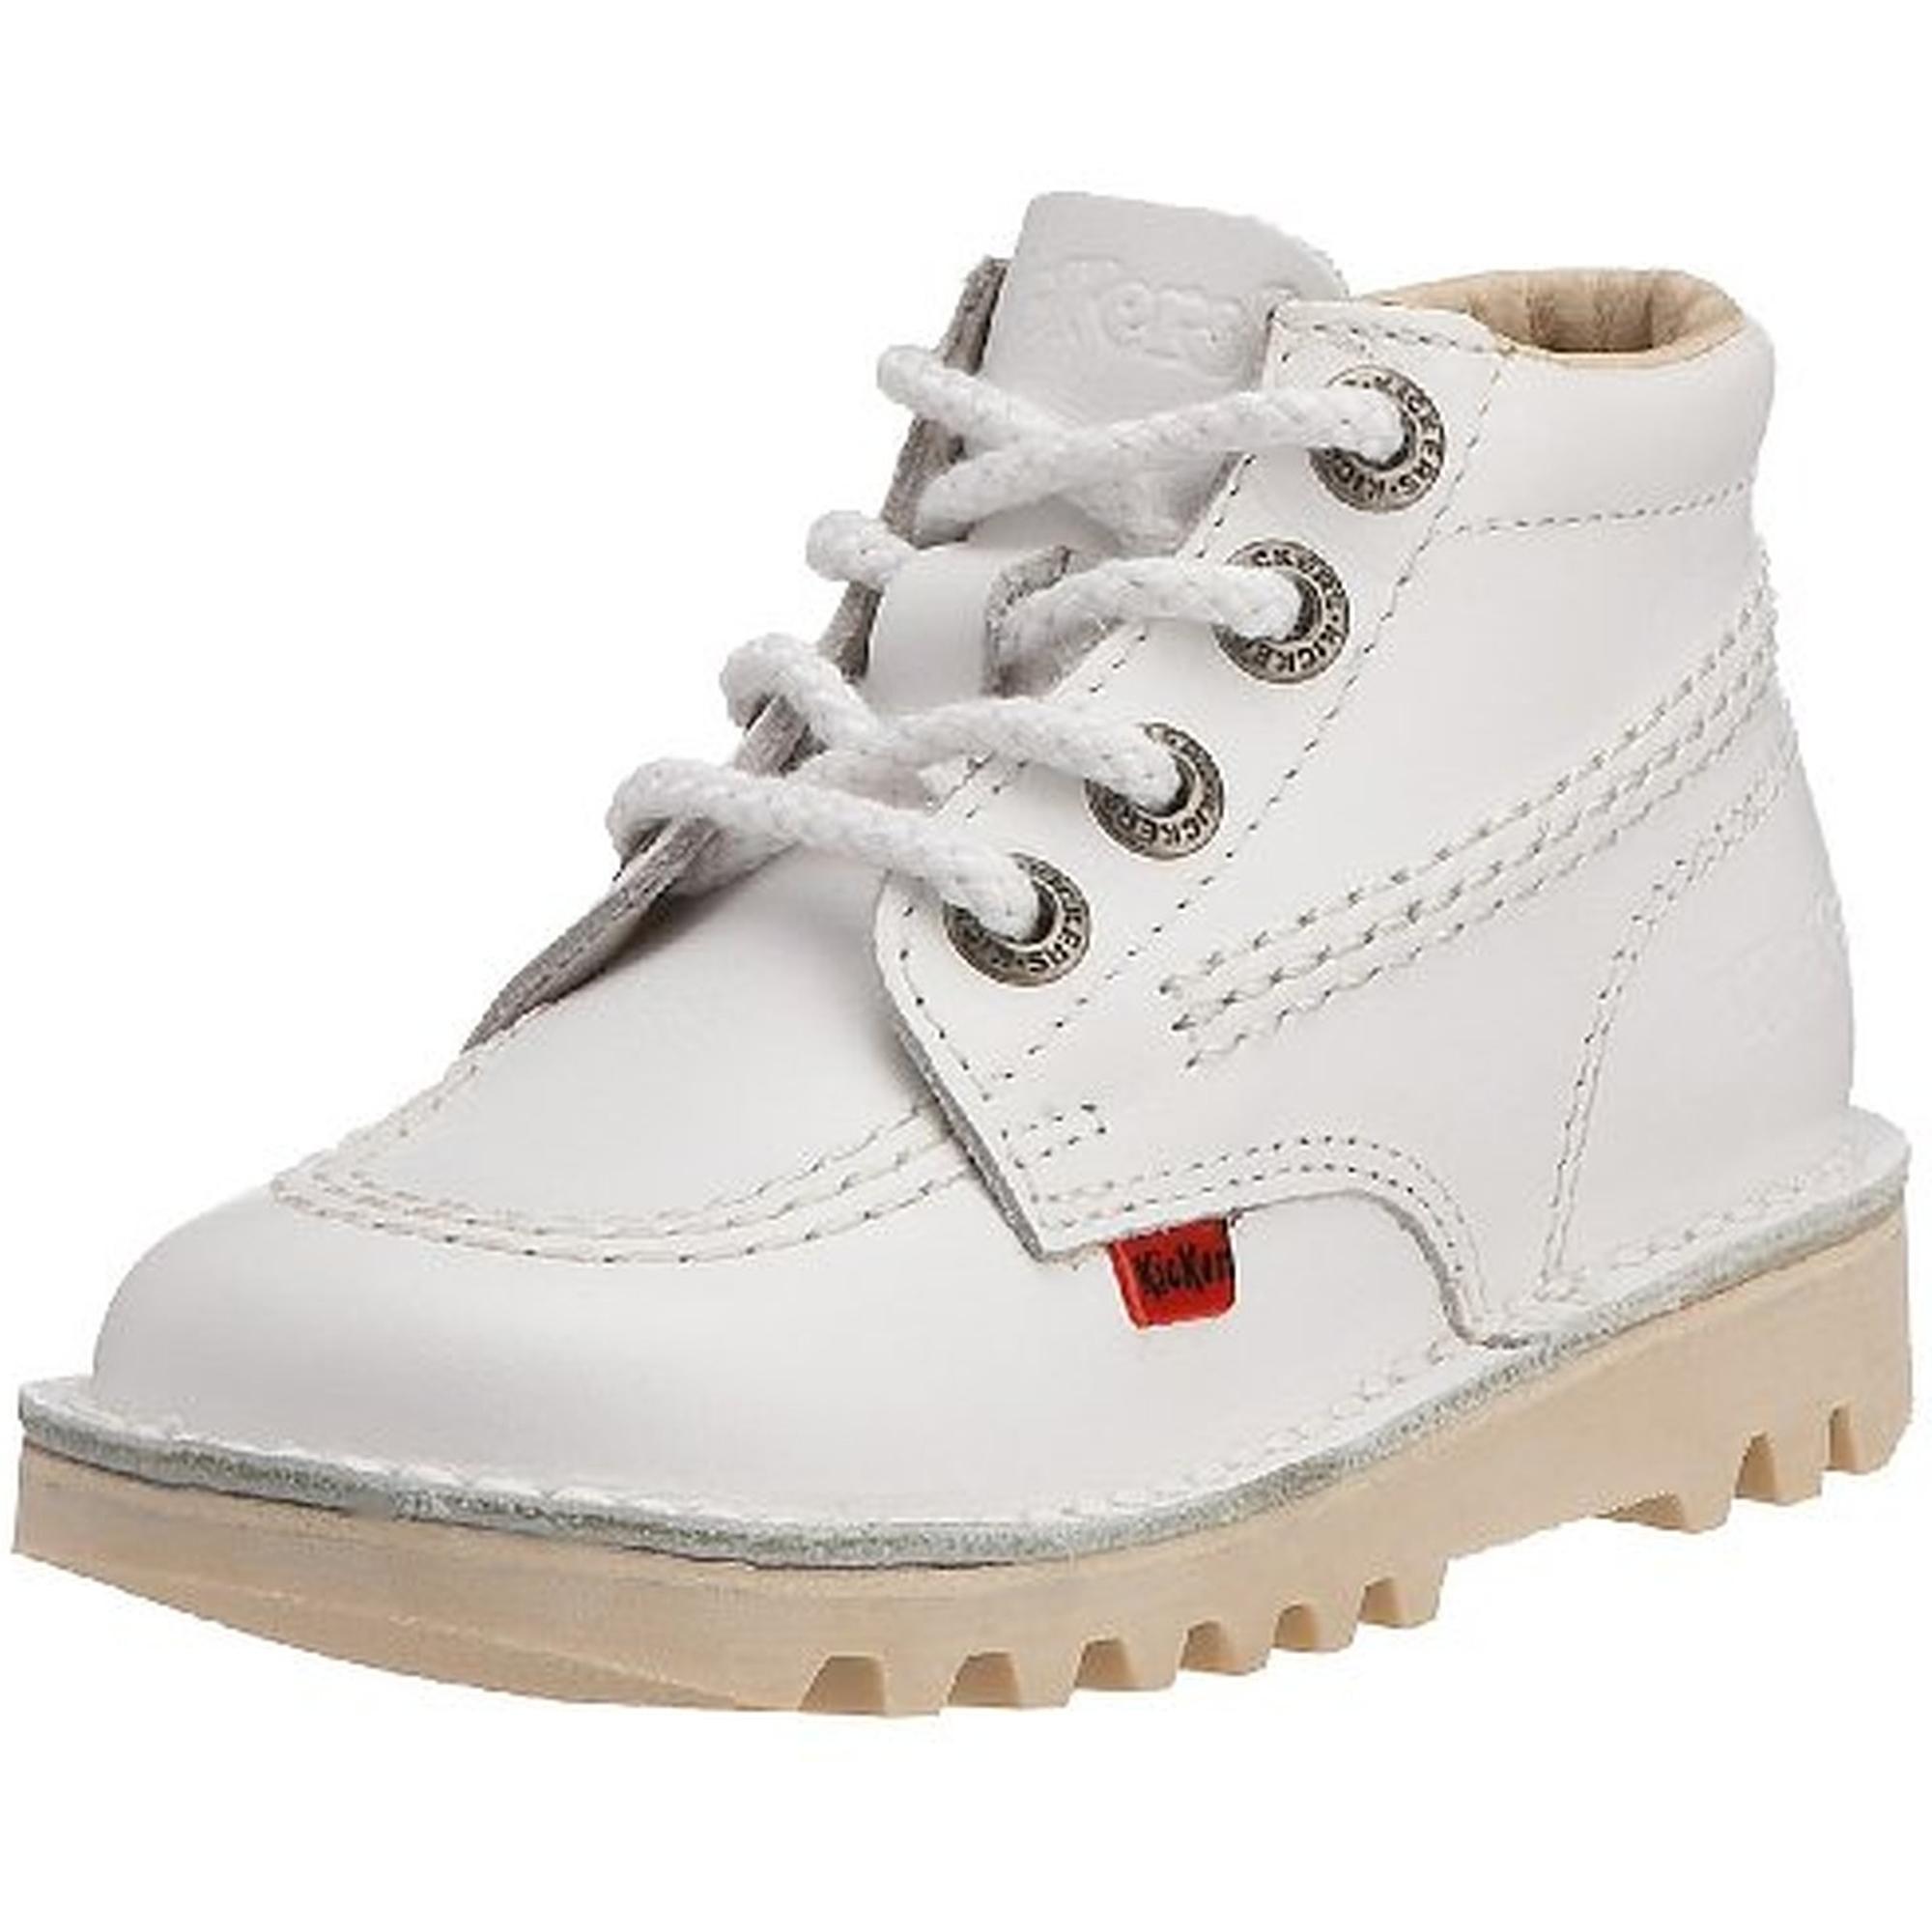 Kick Hi I White Leather - Ankle Boots